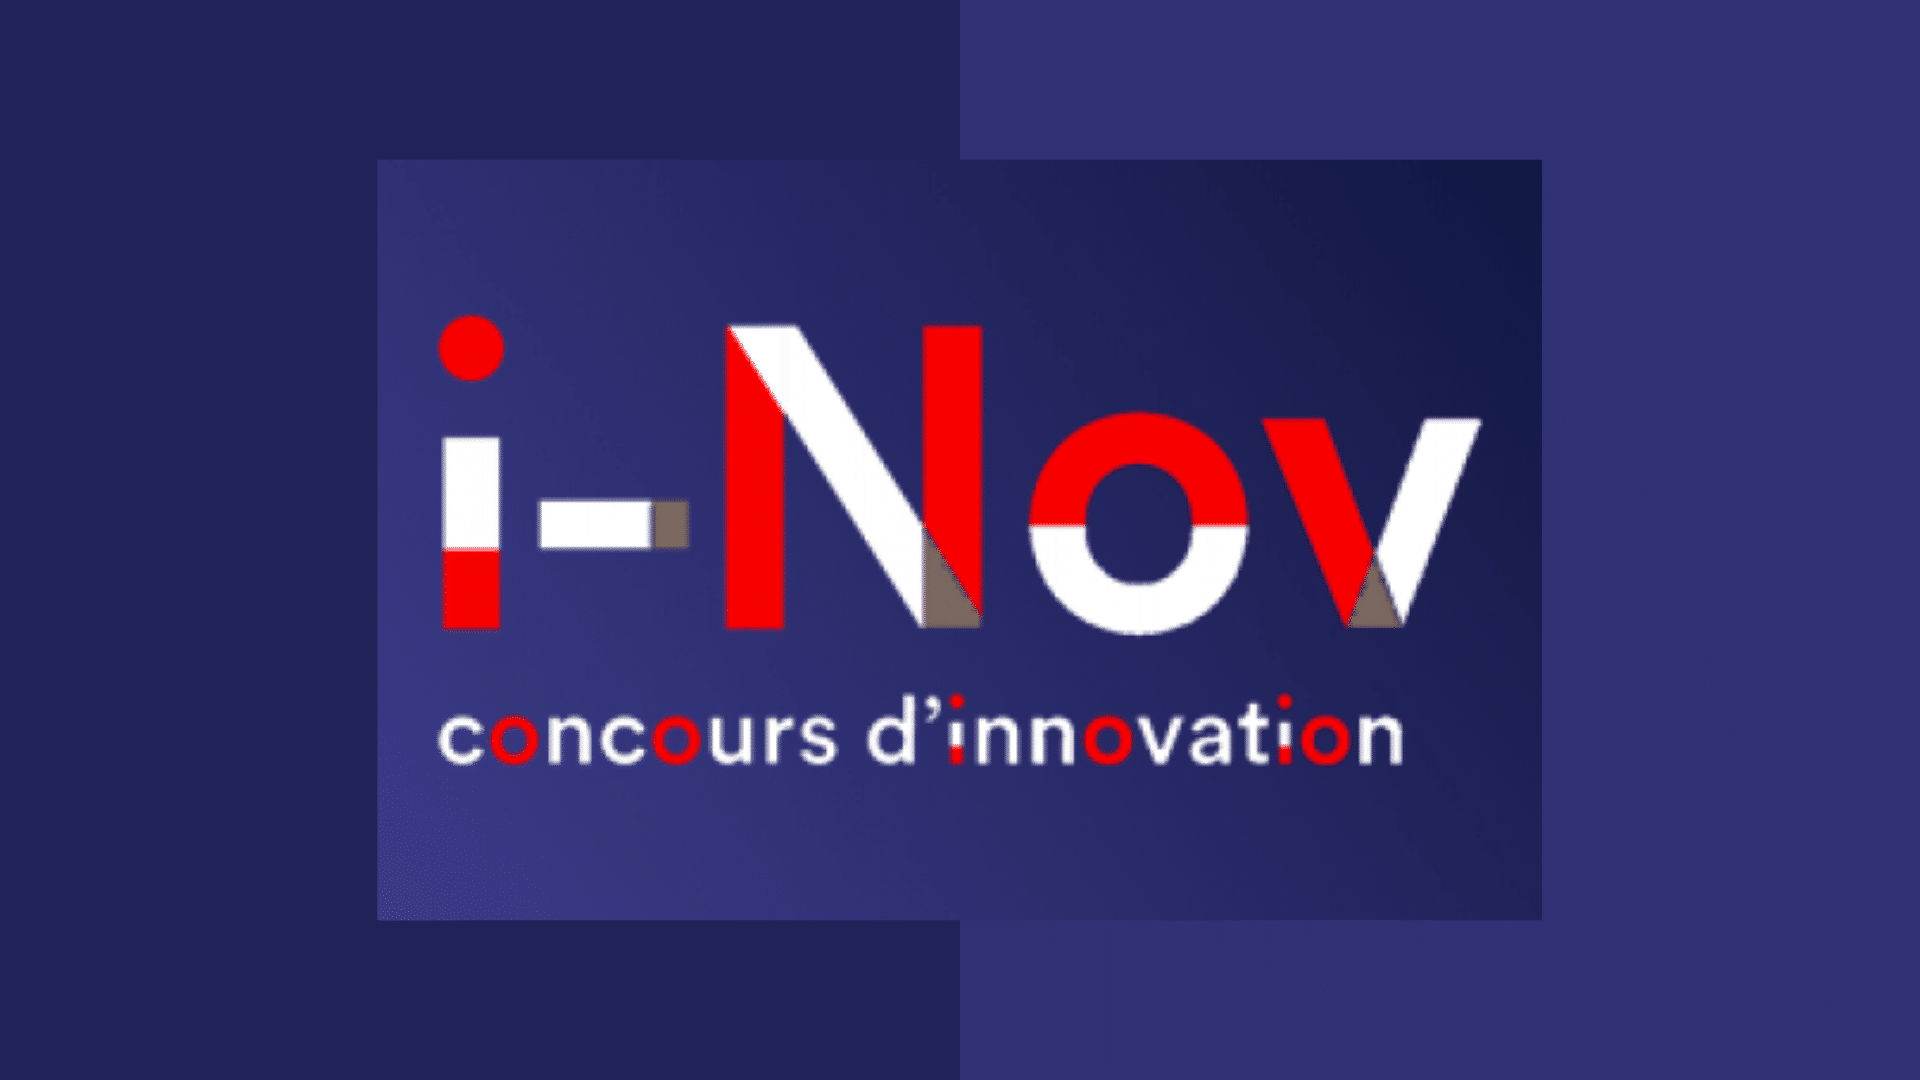 Appel à projets | Concours d'innovation i-Nov – Soutenir l'innovation à fort potentiel